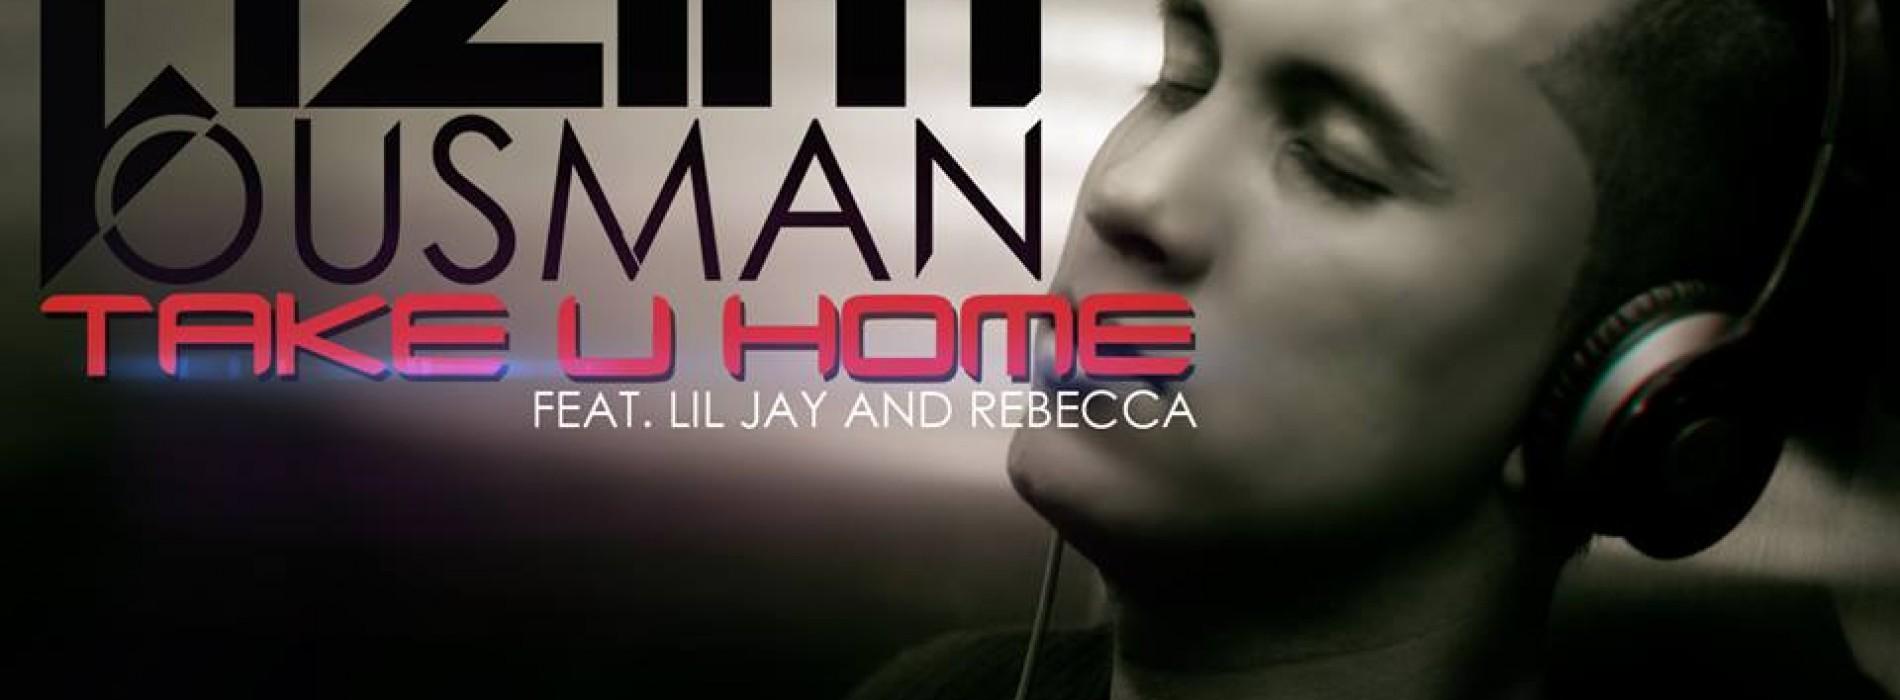 Azim Ousman – Take U Home ft. Lil Jay & Rebecca: The Video